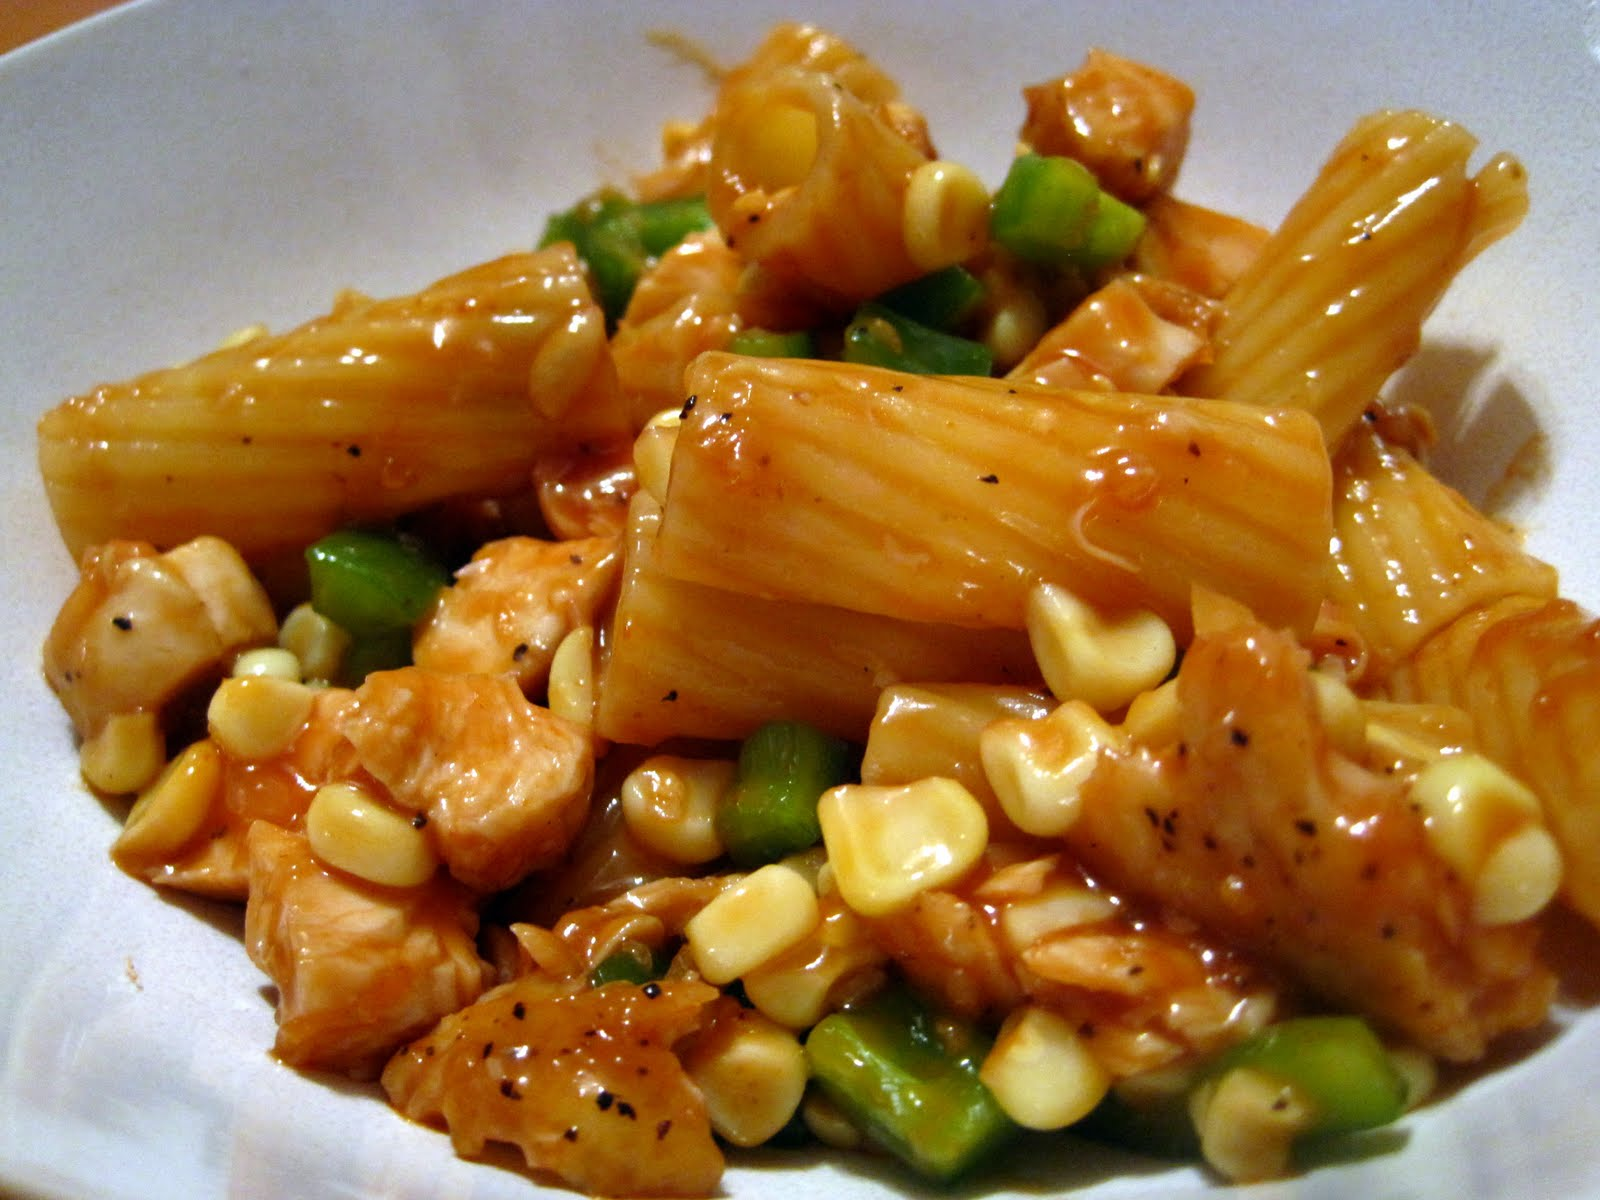 Parmesan Ranch Pasta Salad. The Best Chicken Pasta Salad. View ...